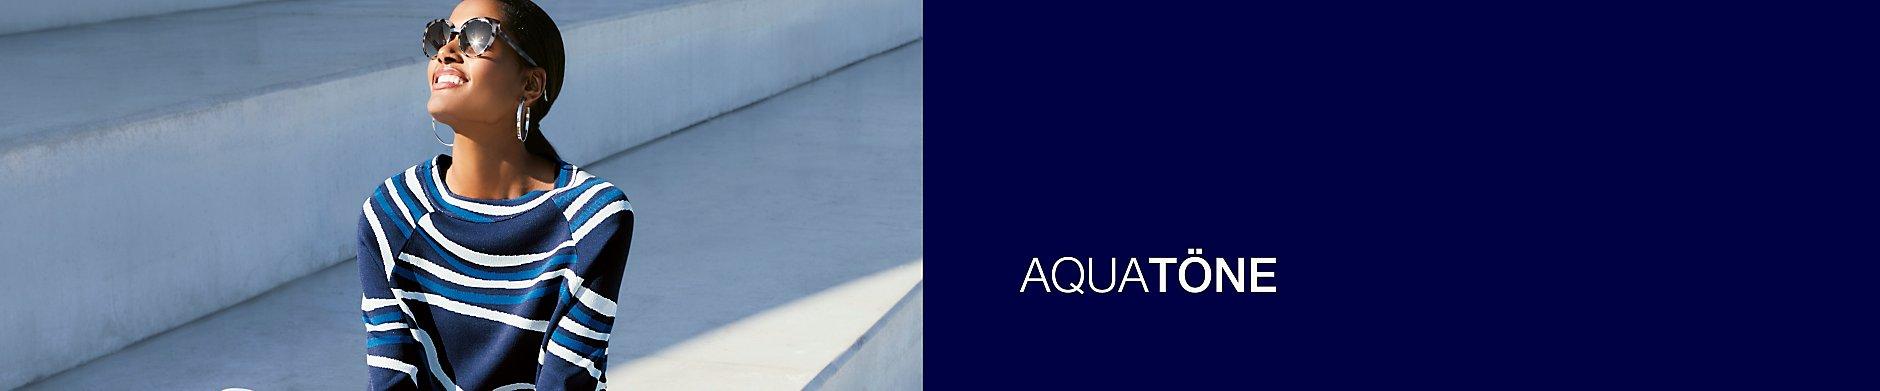 AQUATÖNE